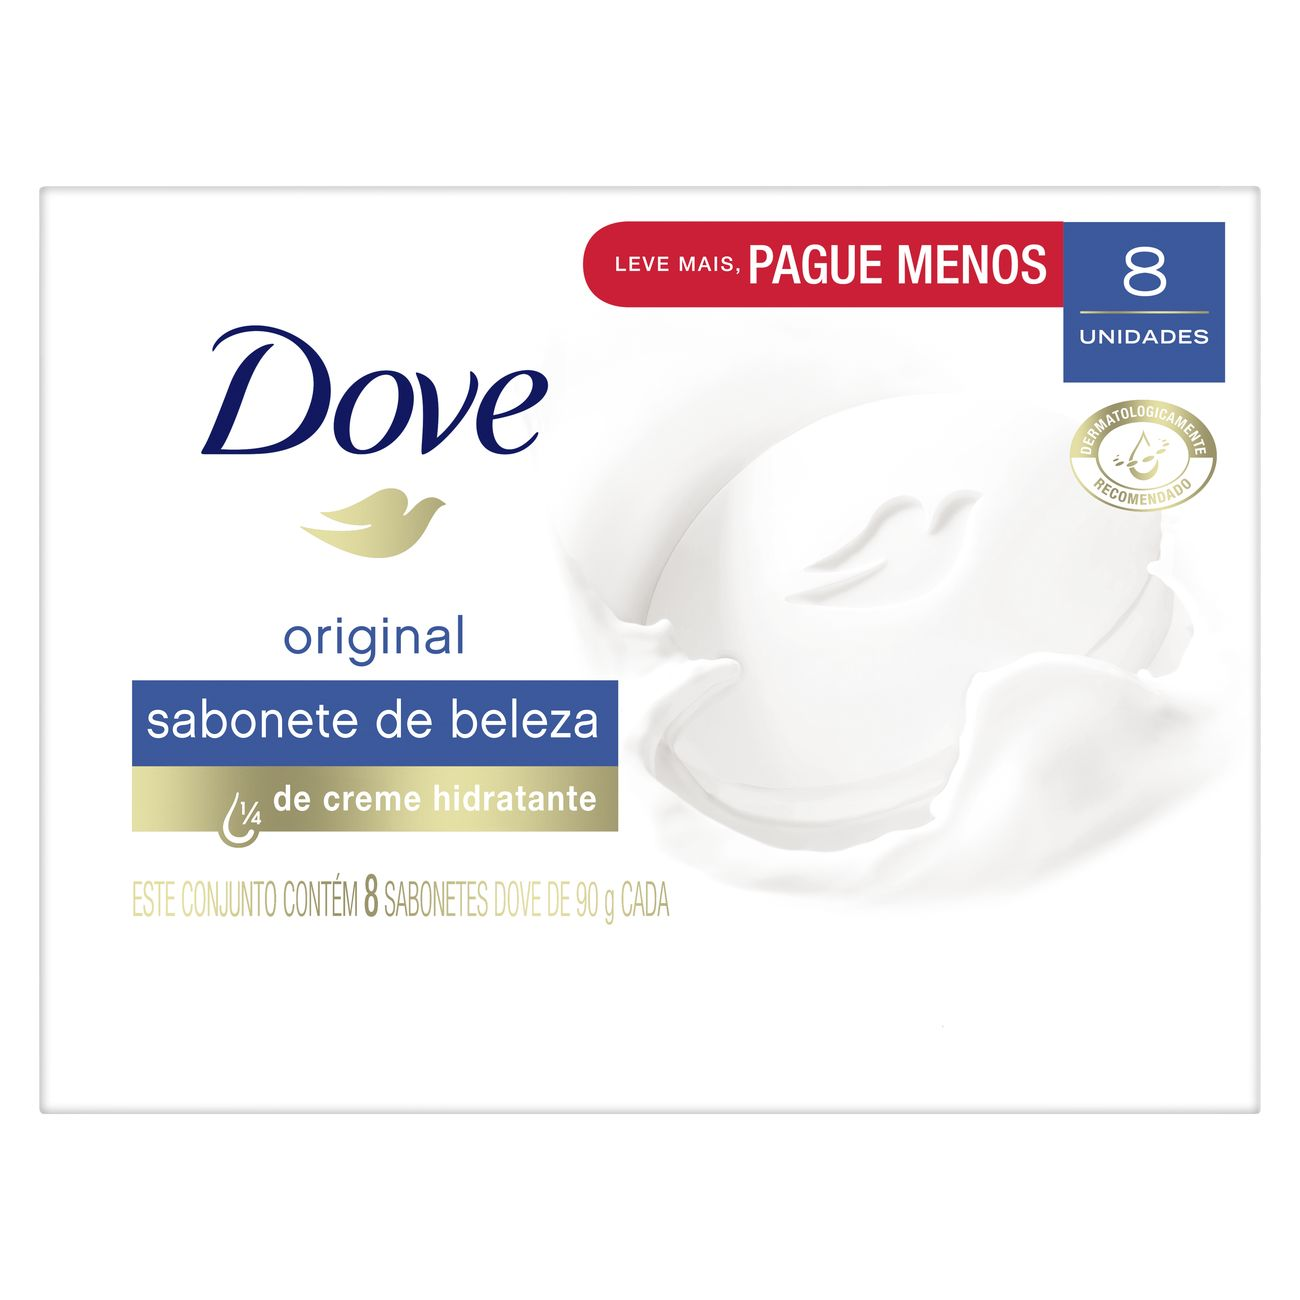 Oferta 8 Sabonetes Em Barra Dove Branco 90g